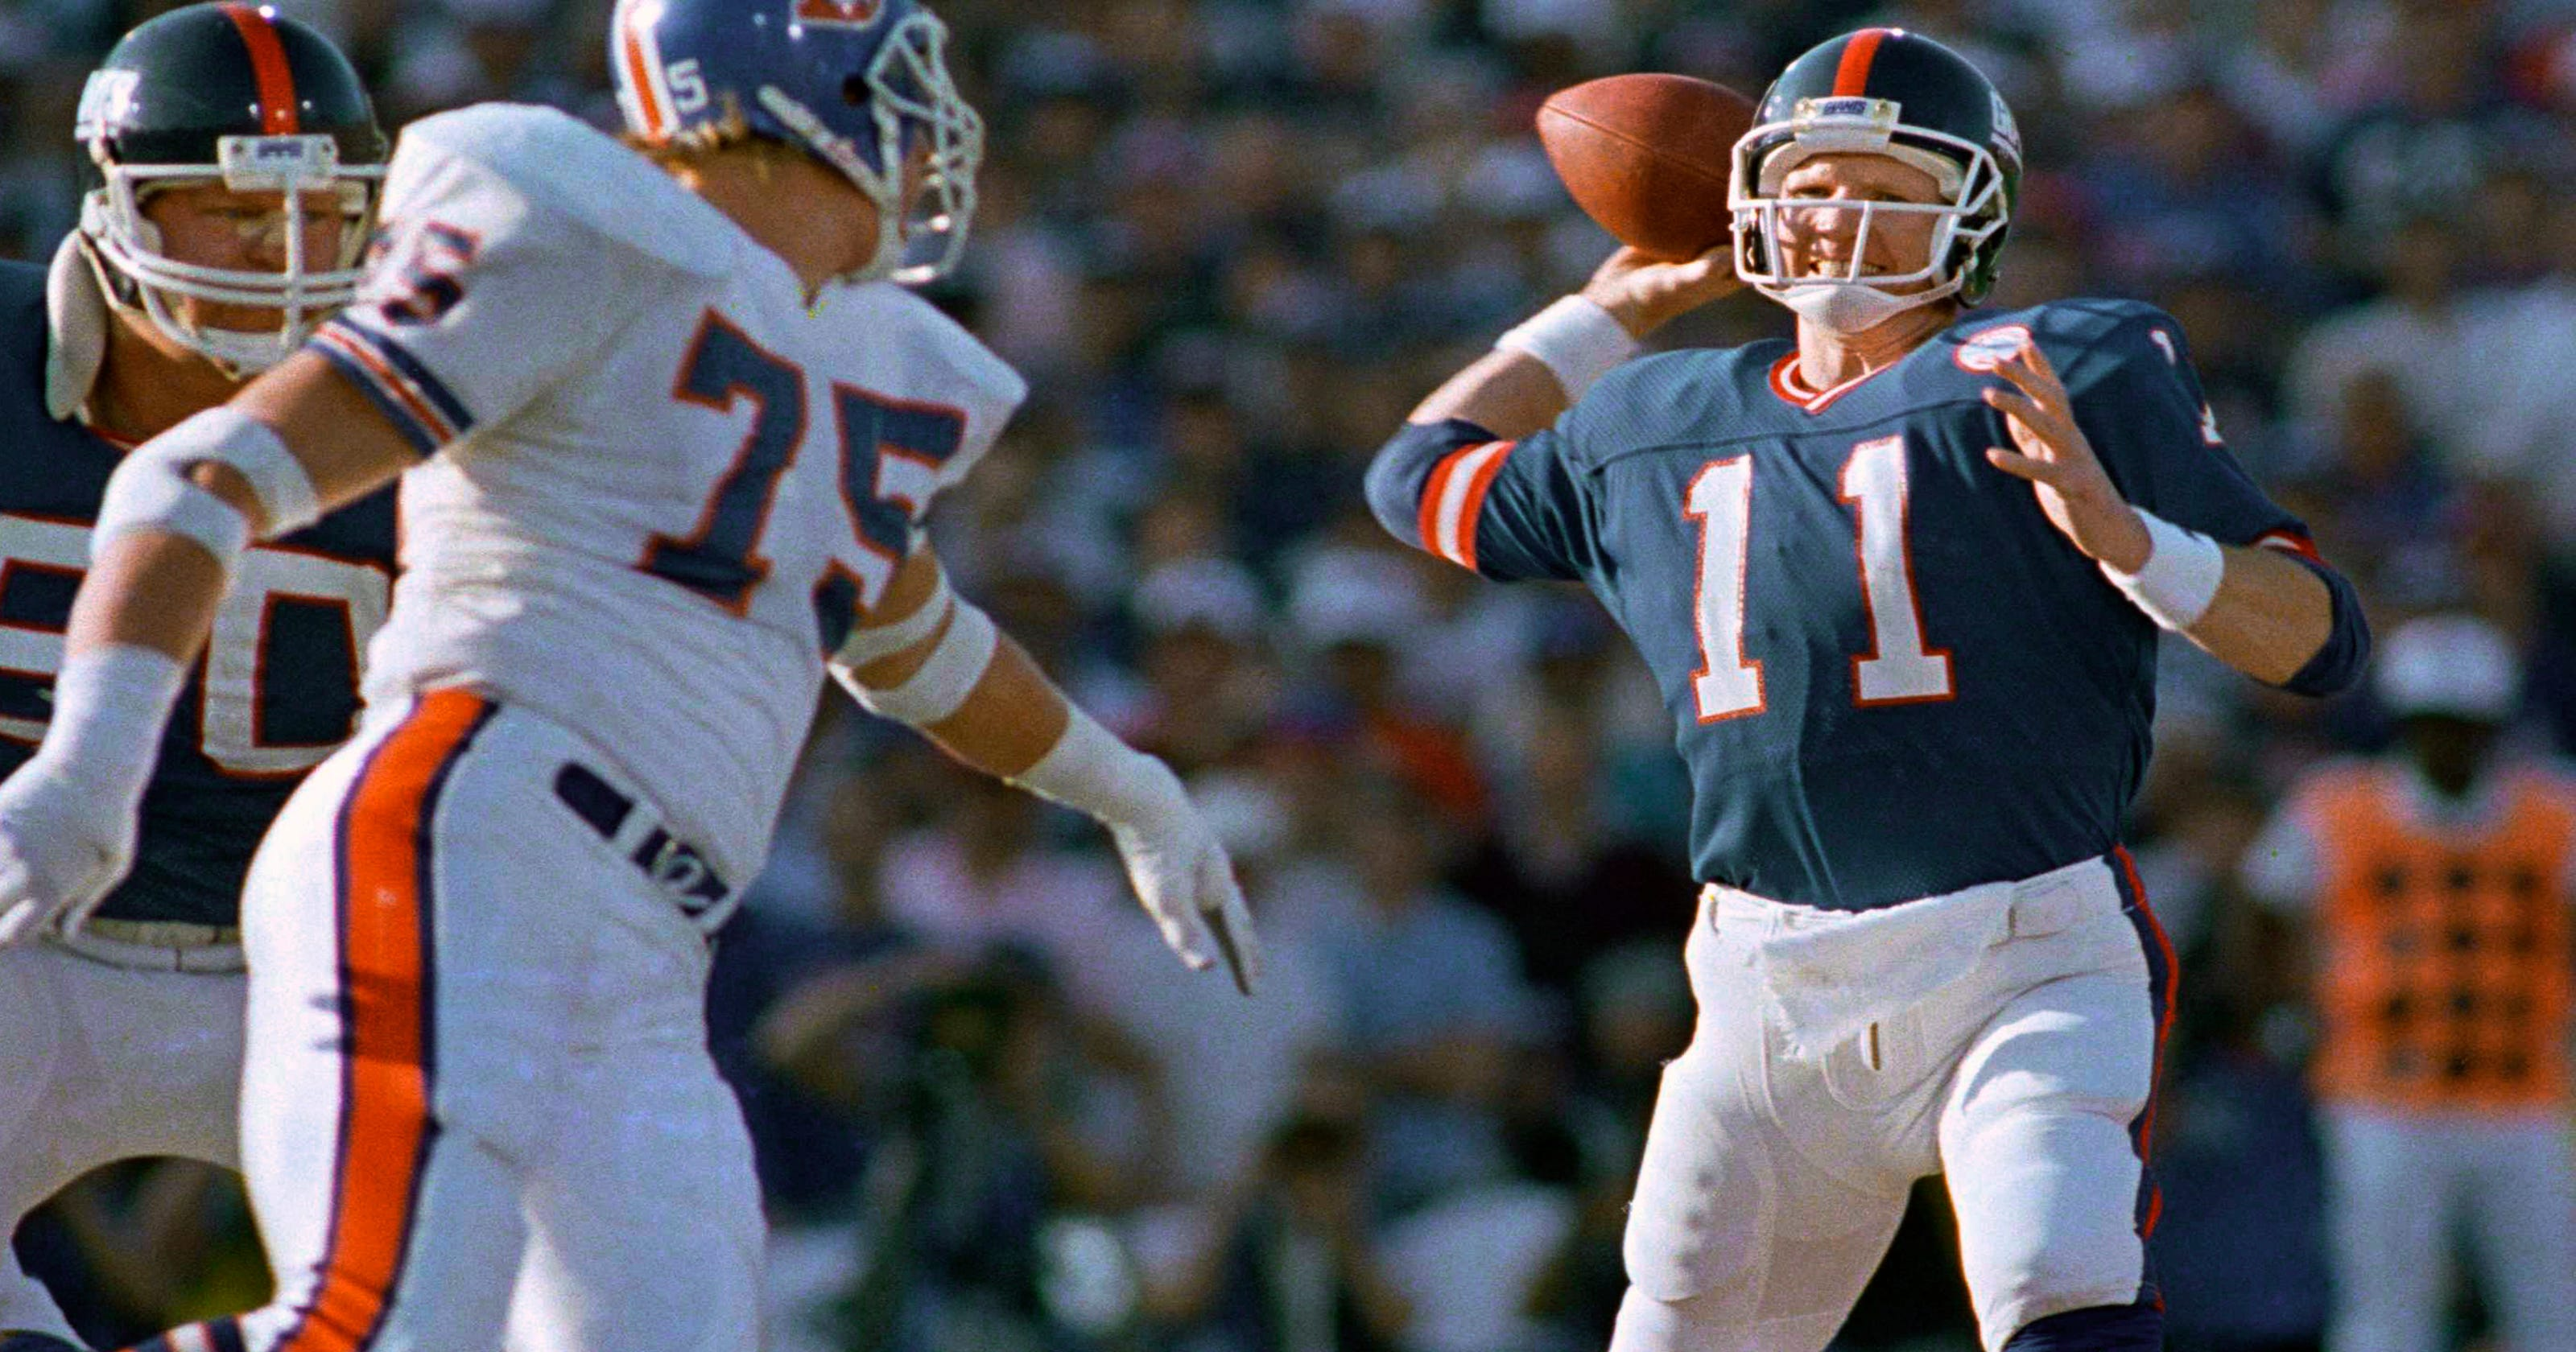 premium selection 4af0d a02e7 New York Giants QB Phil Simms feels Eagles QB Carson Wentz's ...